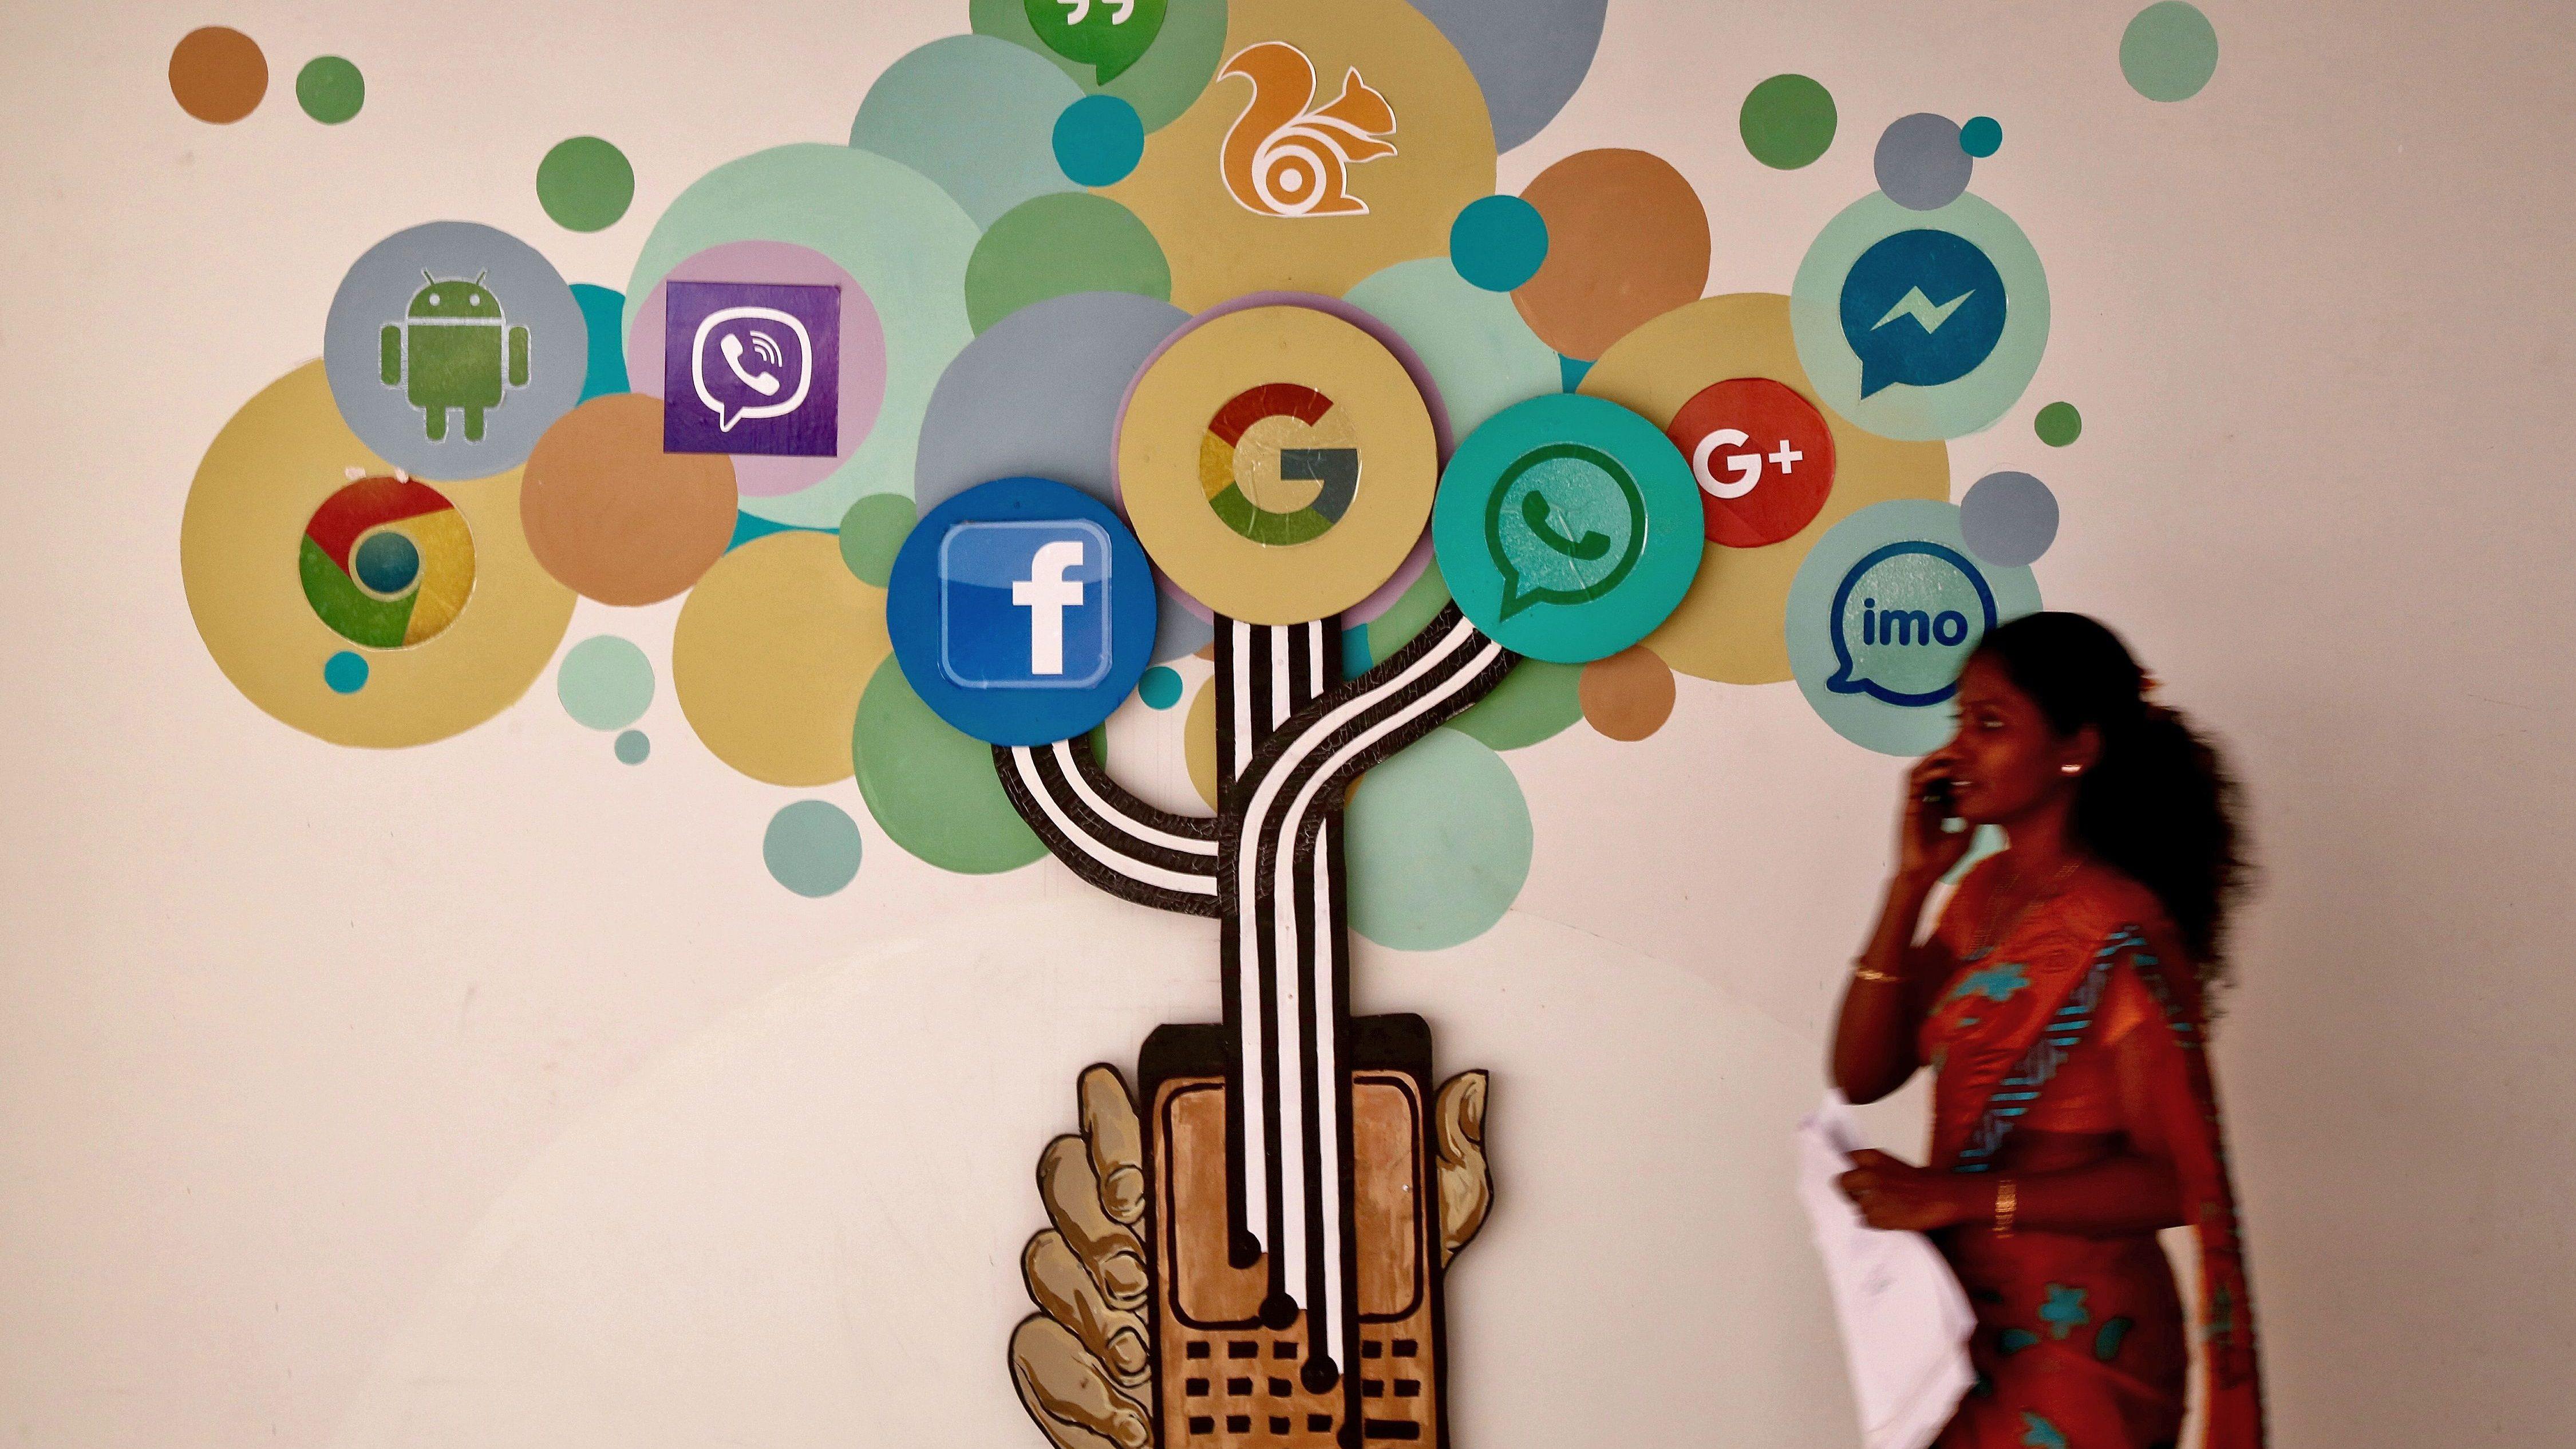 India social media in Bangalore - 09 Feb 2018